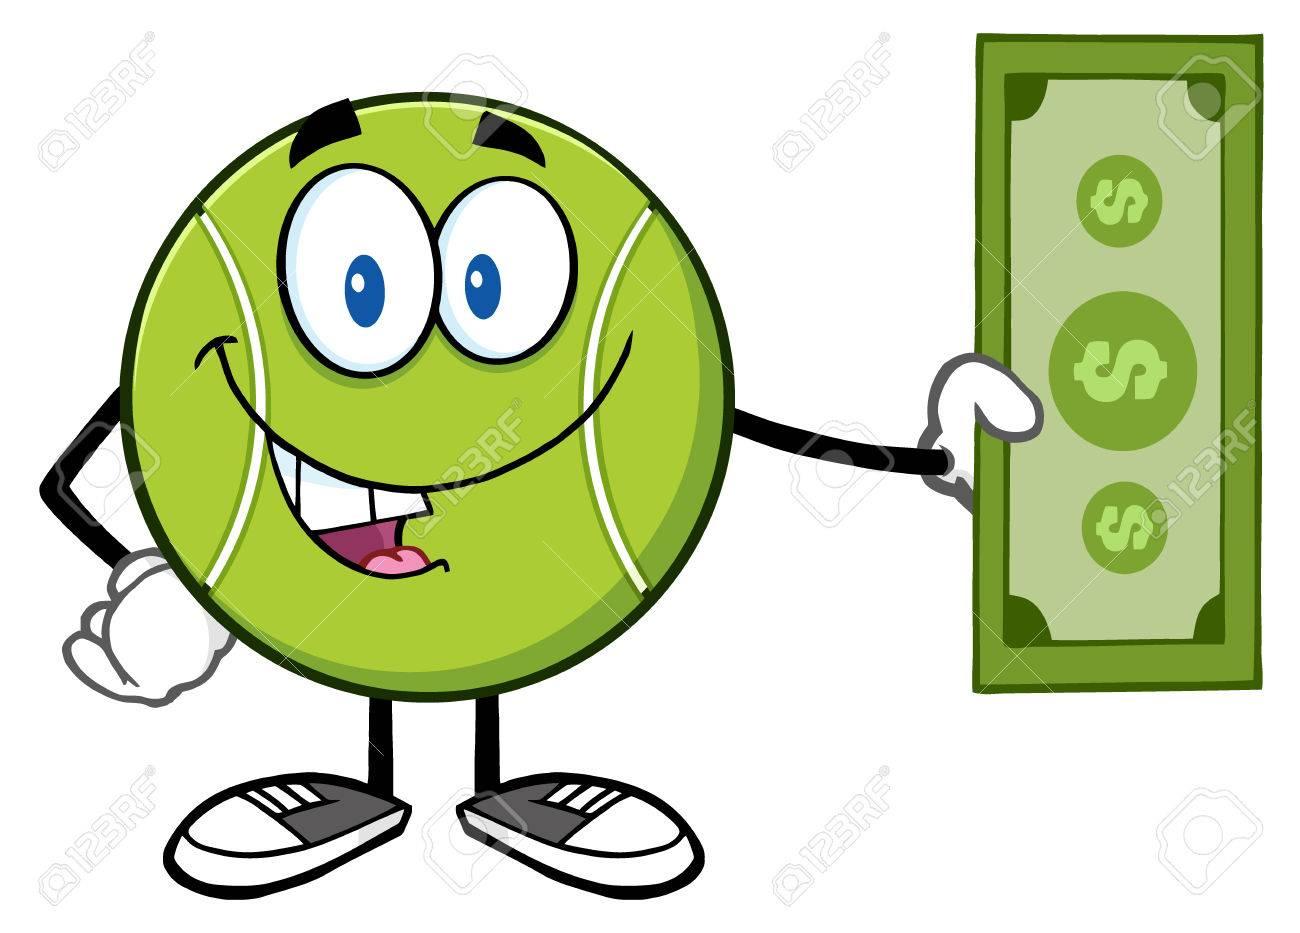 Tennis ball mascot stock photos tennis ball mascot stock photography - Tennis Ball Cartoon Mascot Character Holding A Dollar Bill Stock Photo 57271034